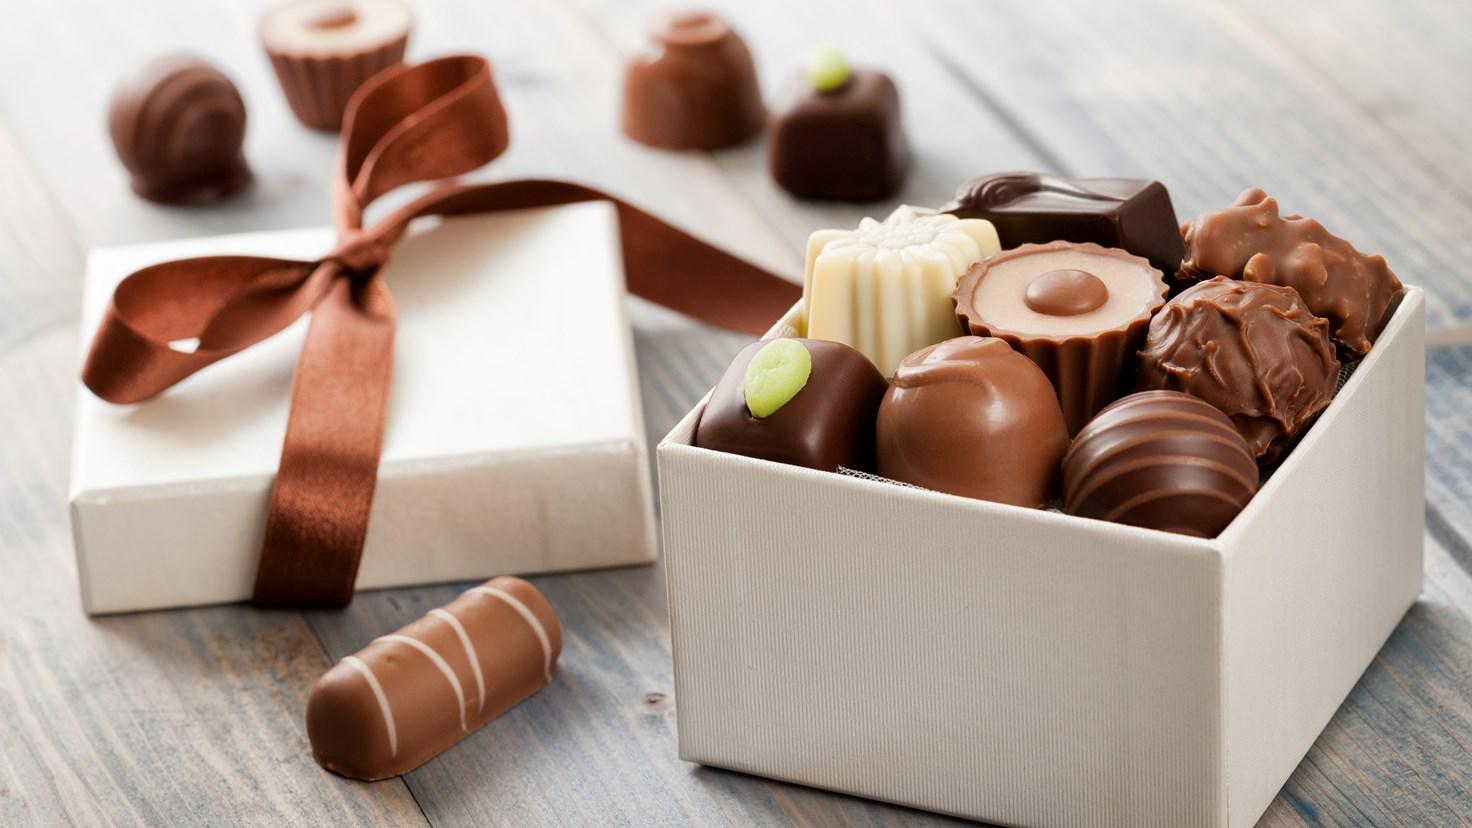 Chocolates Made With Ammonium Phosphatide Emulsifier from Palsgaard